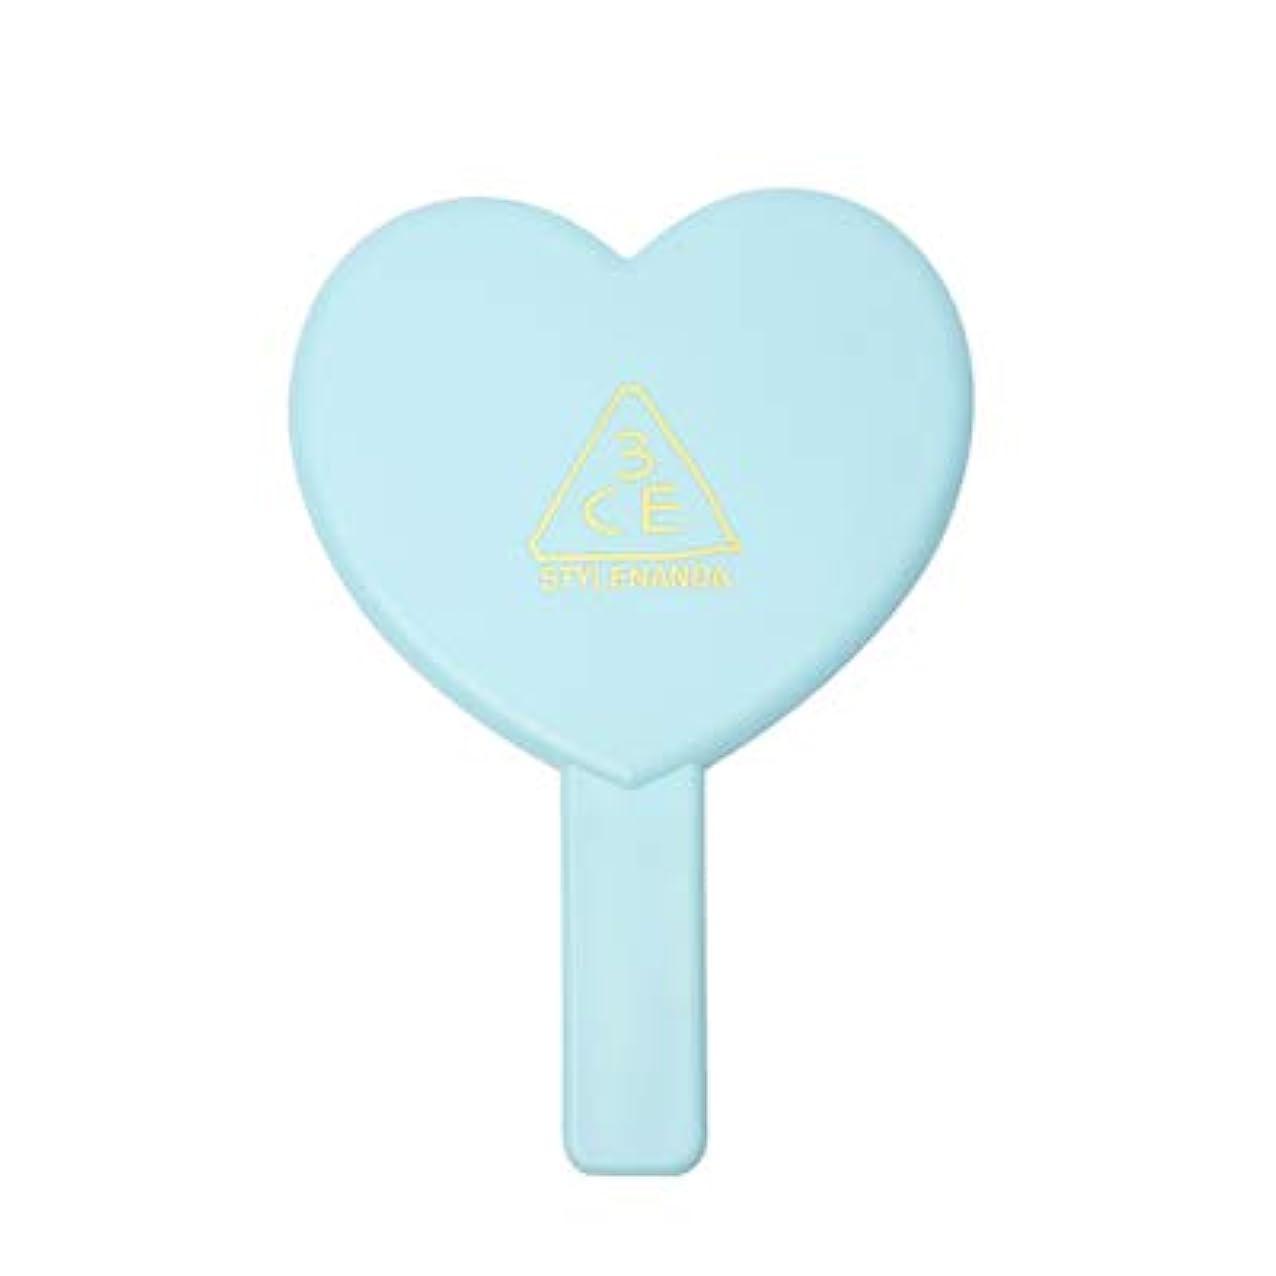 3CE LOVE 3CE HEART HAND MIRROR (BLUE) / ラブ3CEハート?ハンド?ミラー (ブルー)[並行輸入品]